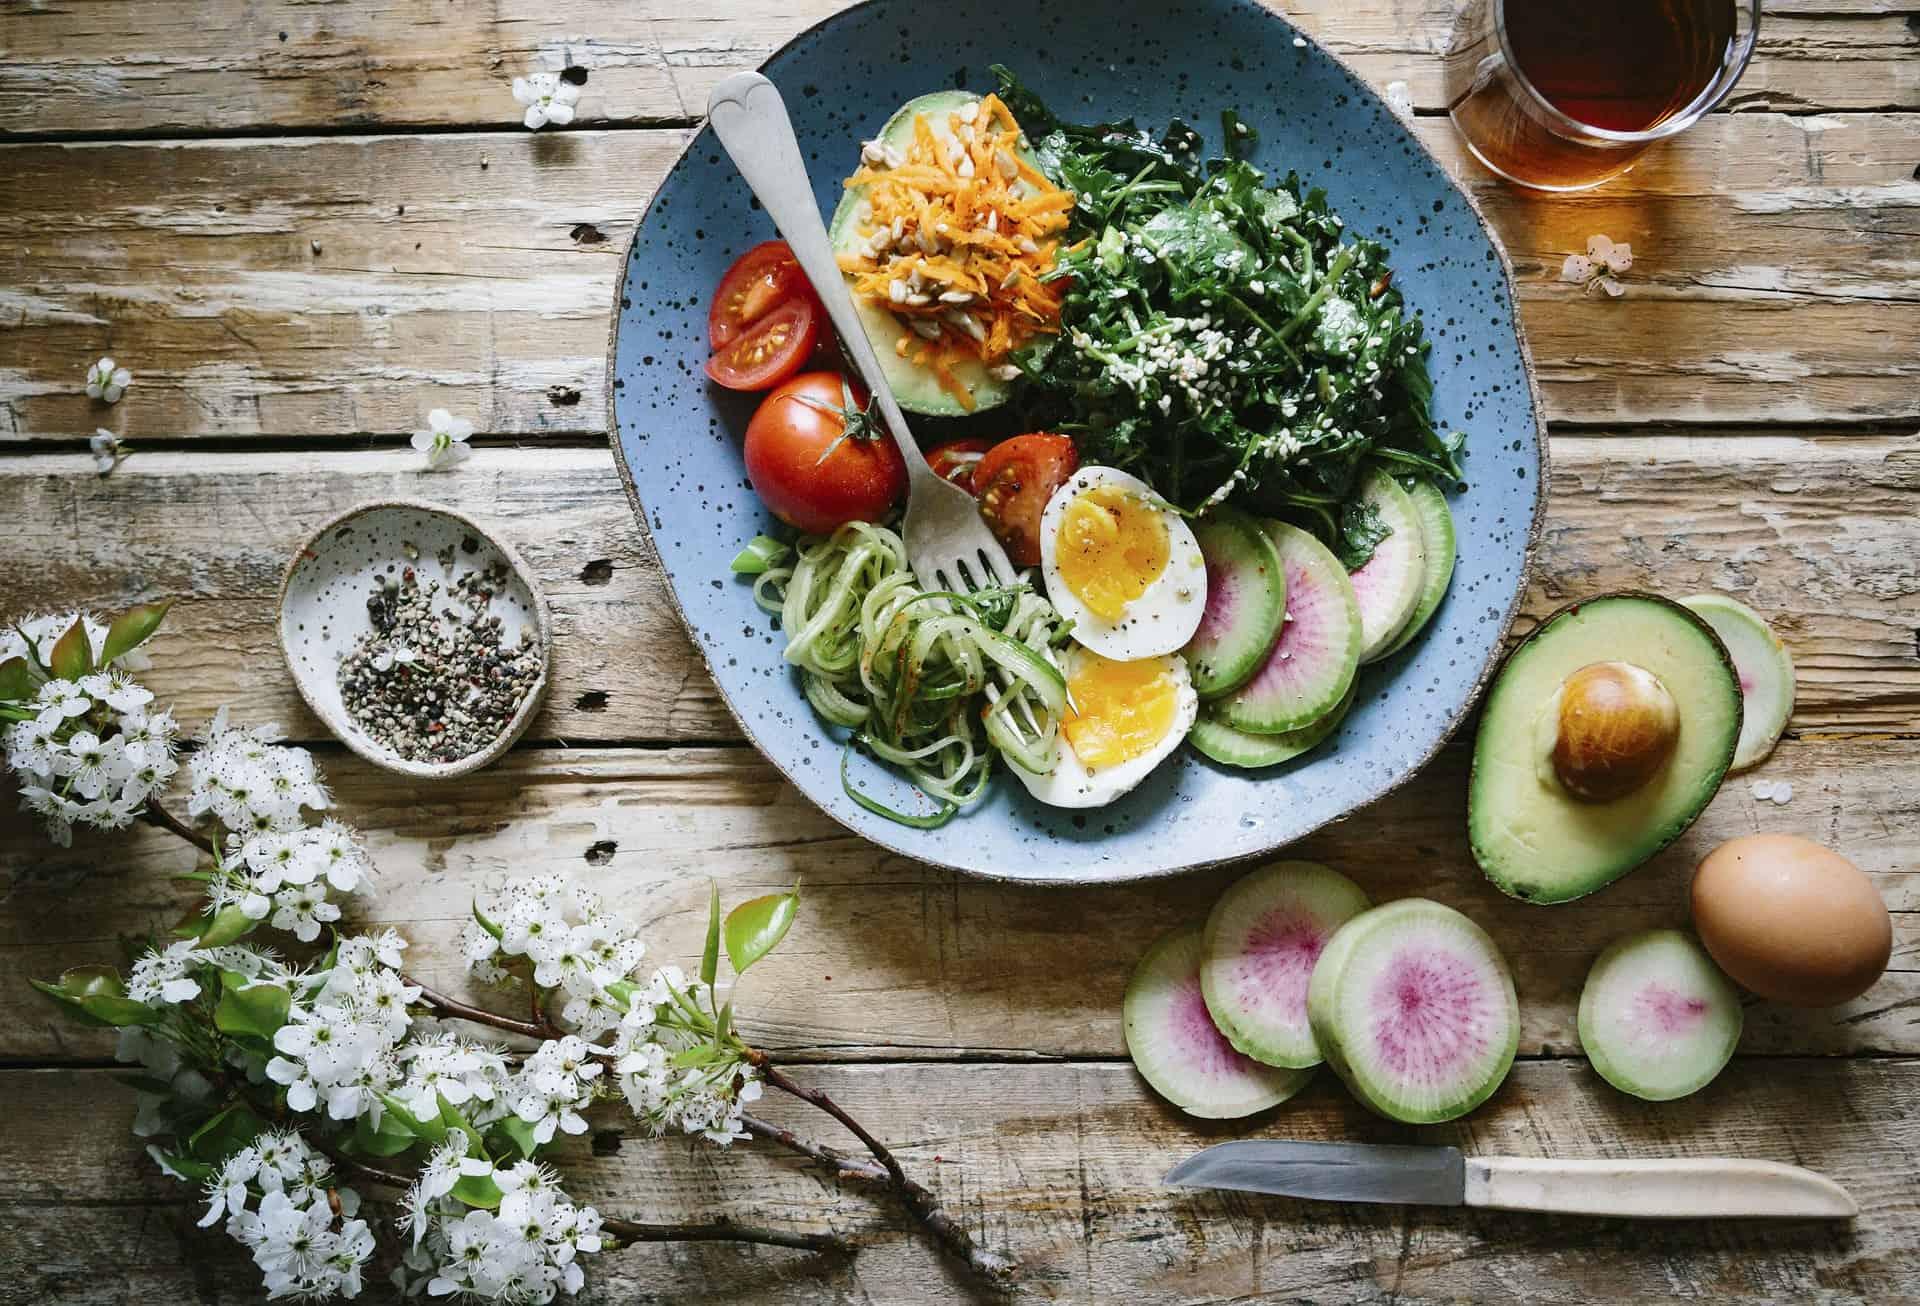 Veggies for keto food list